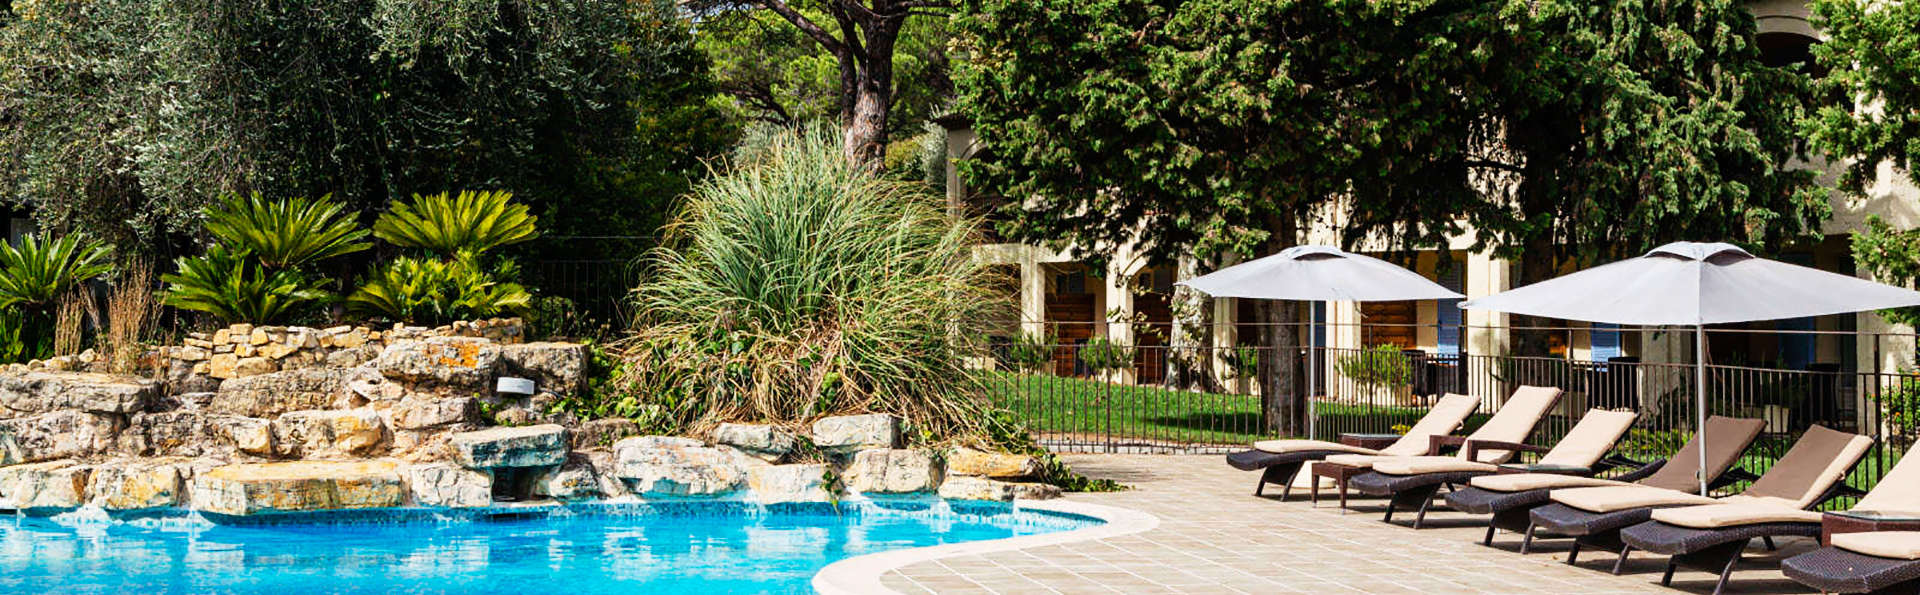 Hôtel Spa la Lune de Mougins - EDIT_pool2.jpg